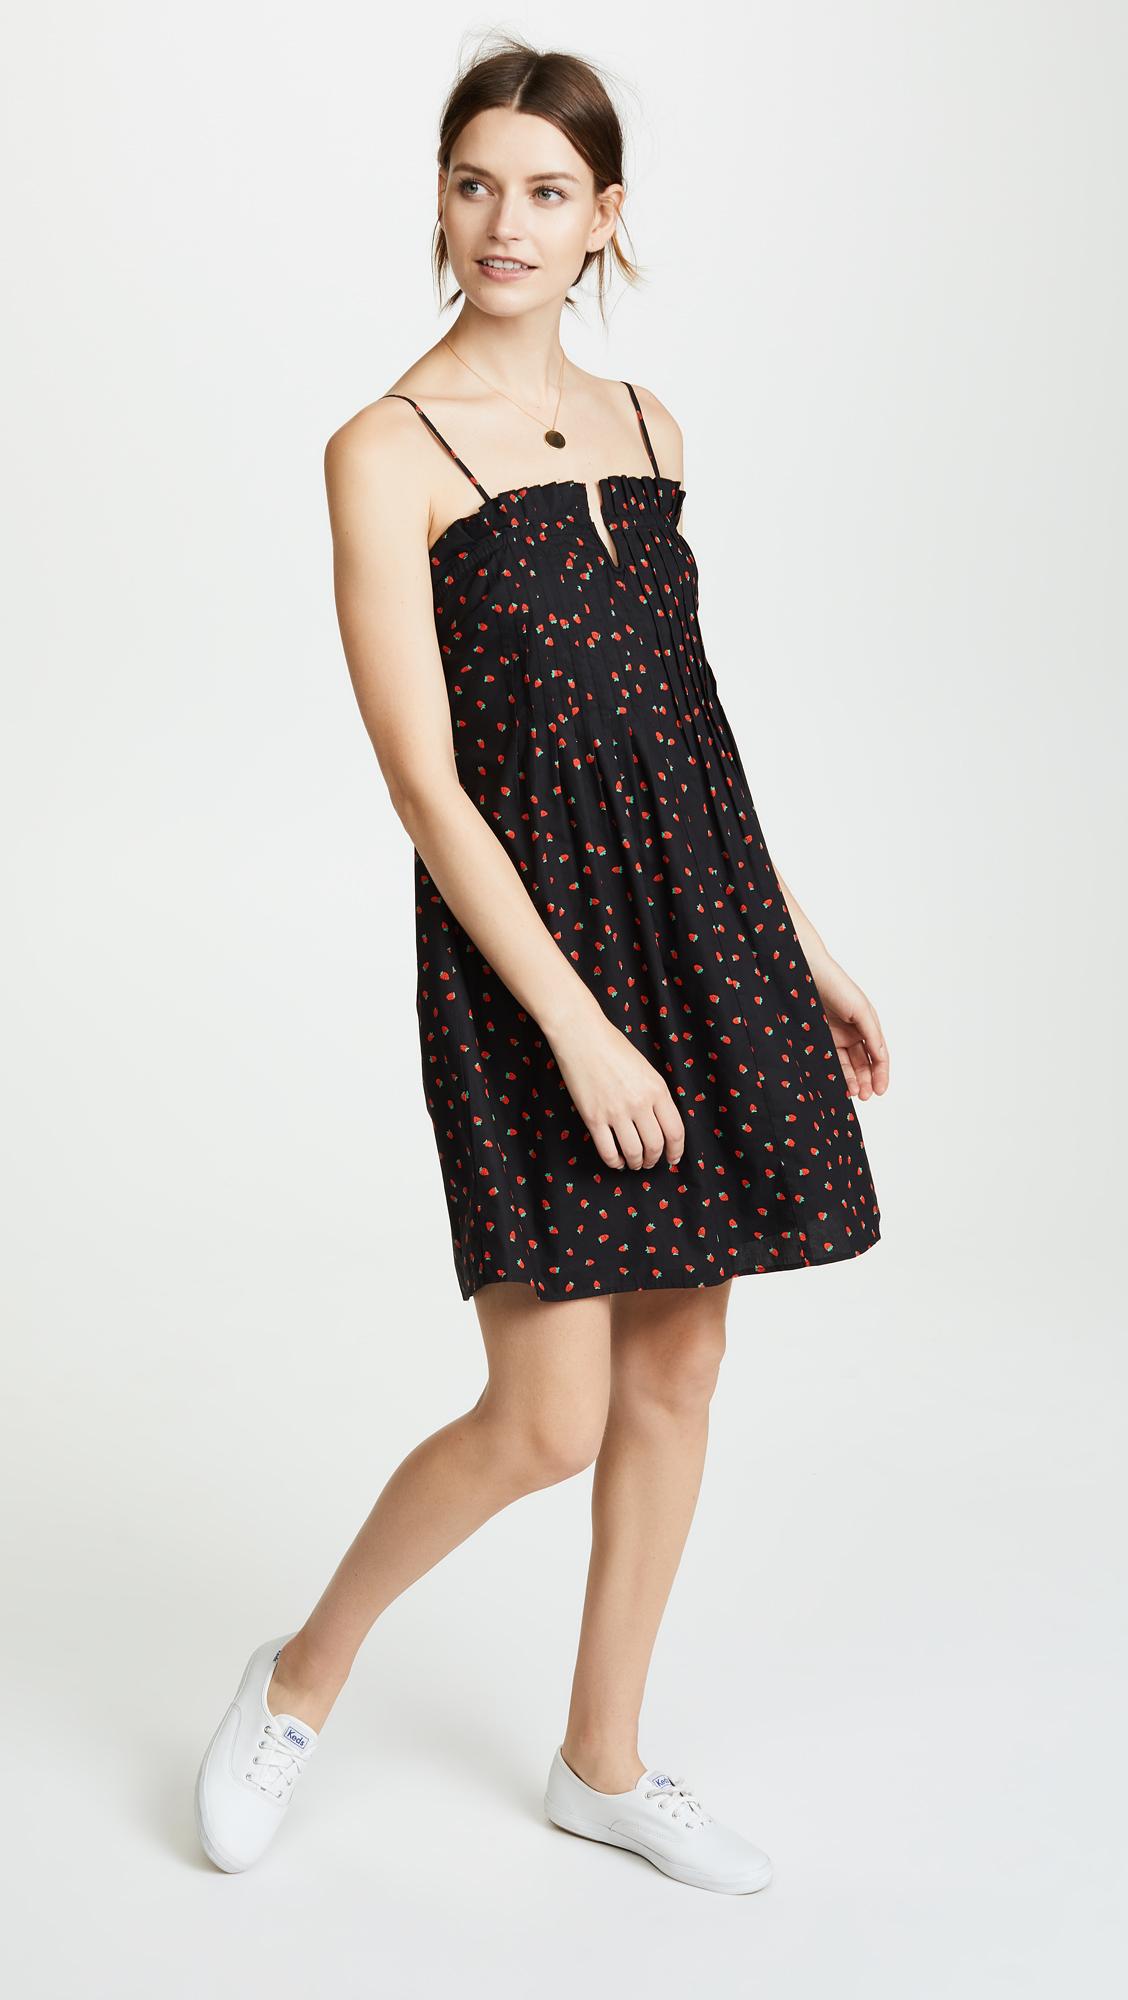 b3f0c14b9d Madewell Strawberries Pintuck Ruffle Cami Dress